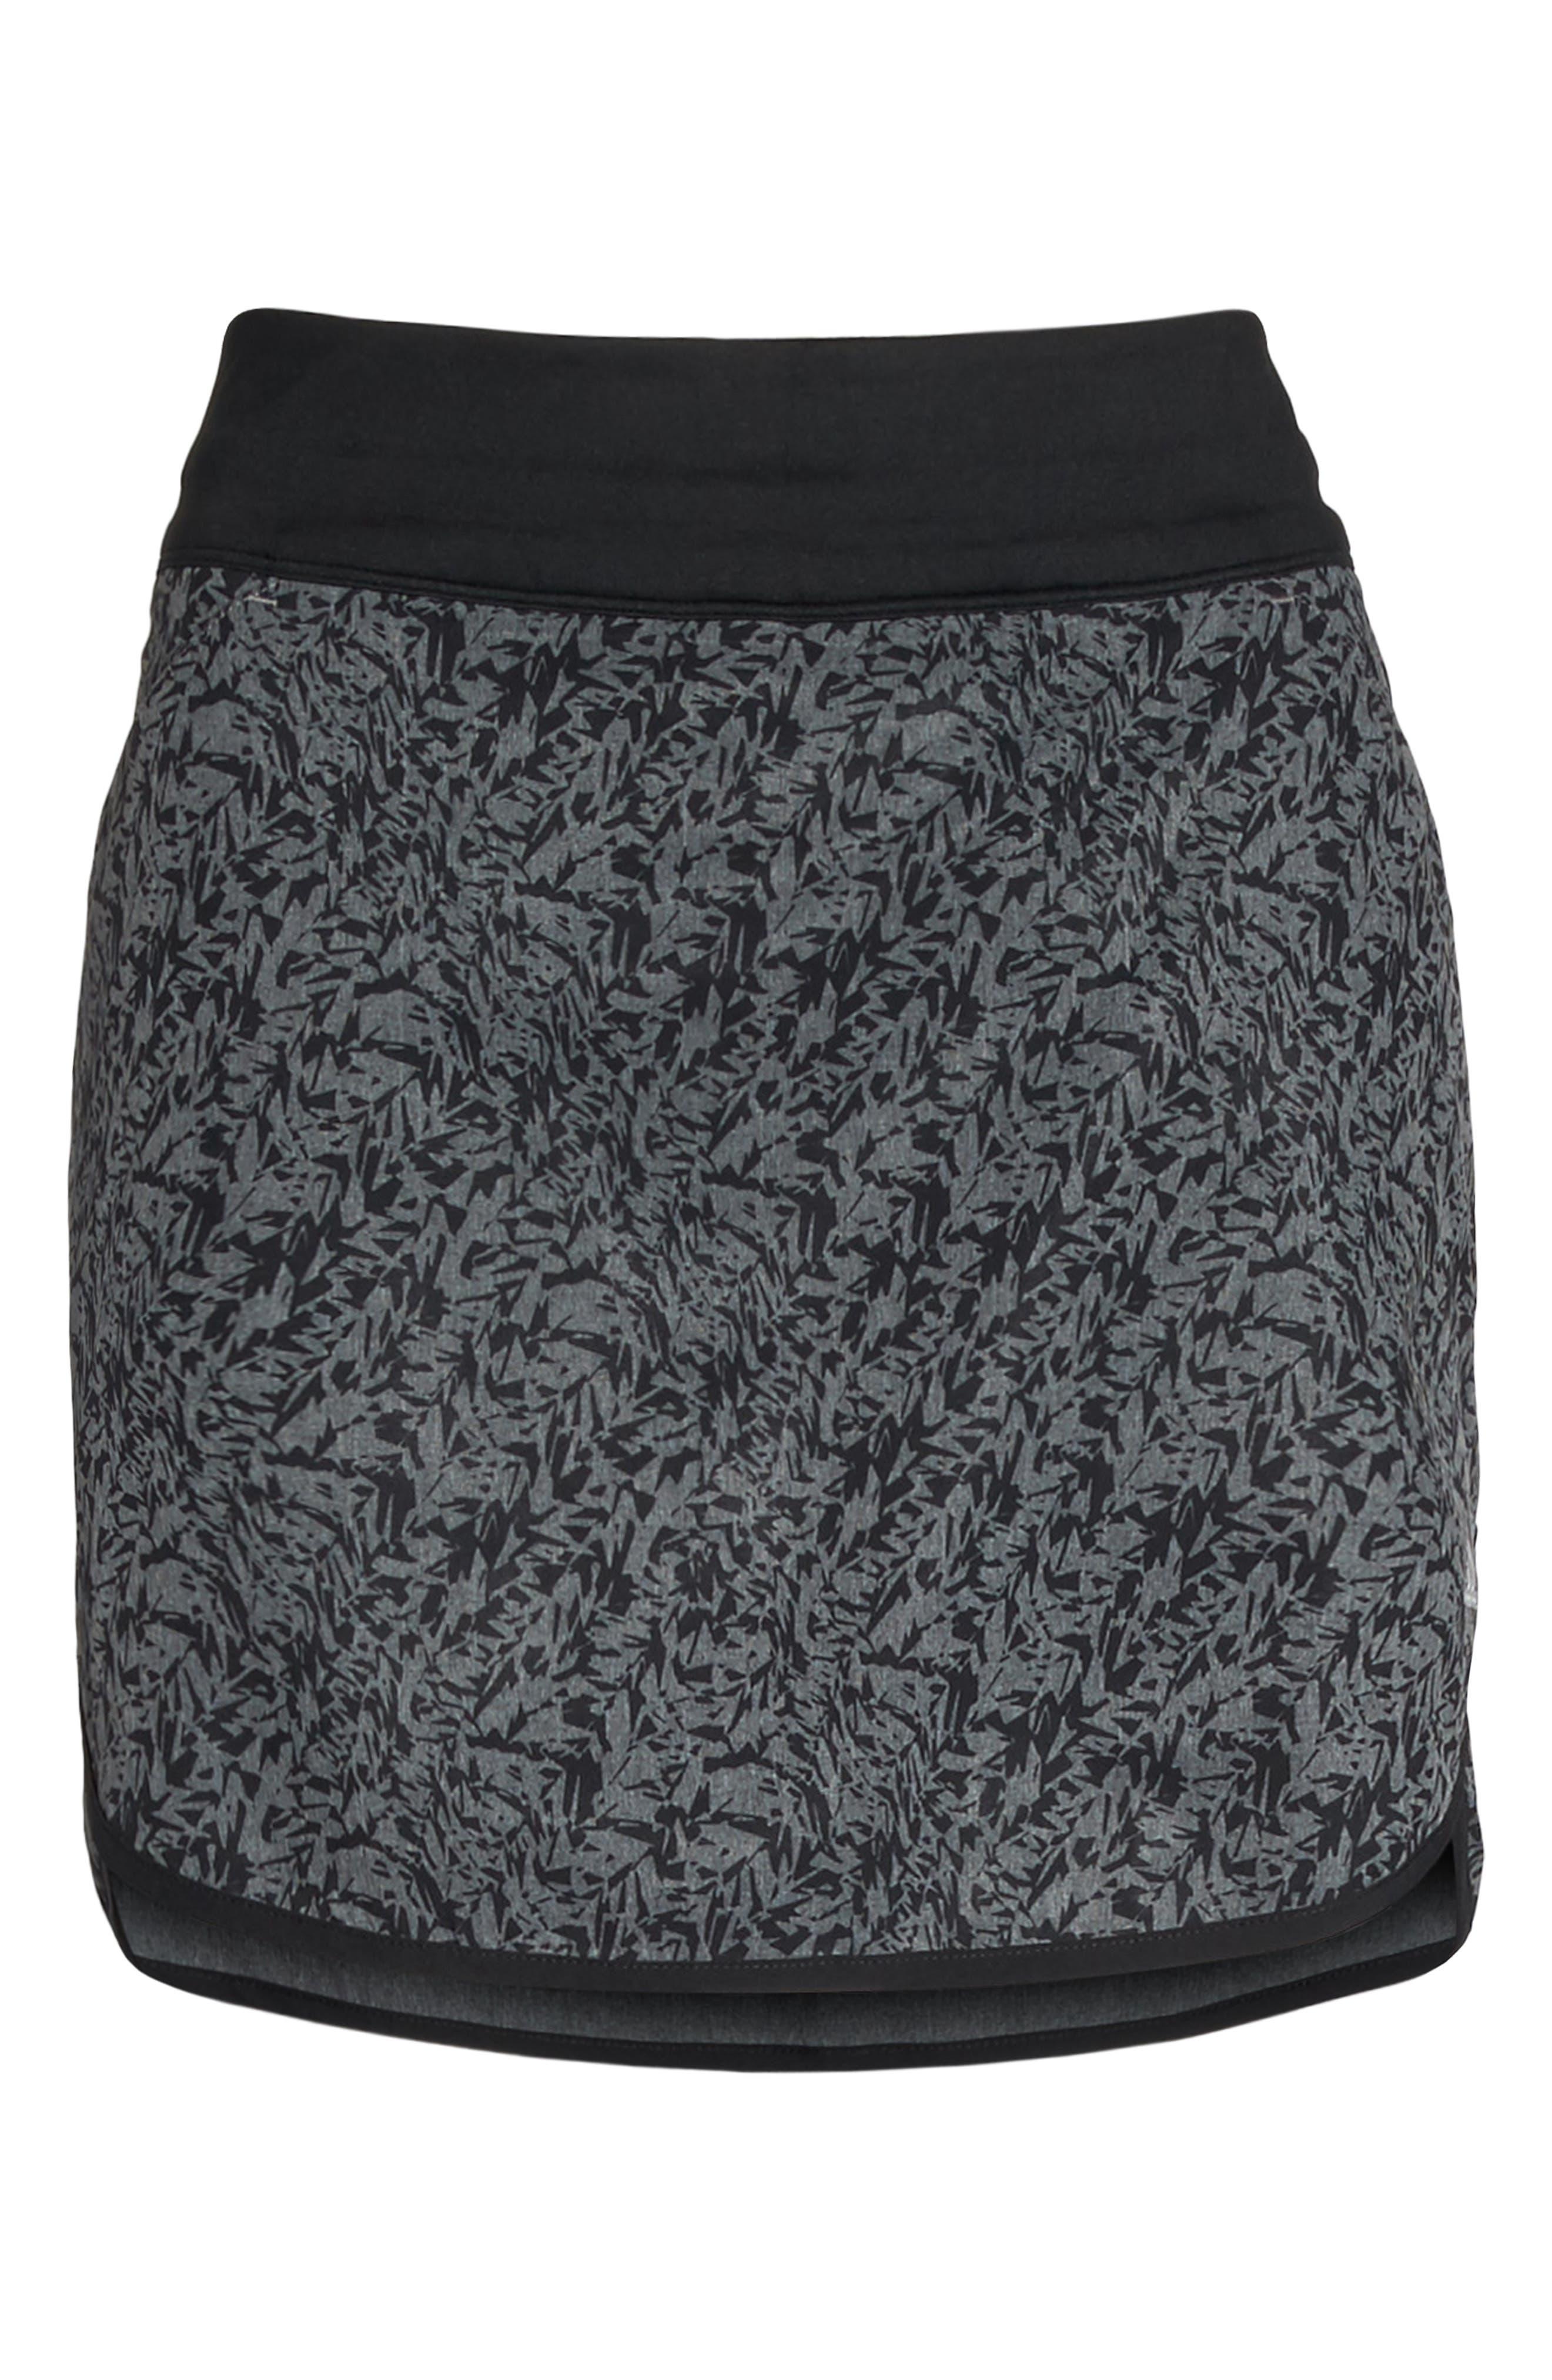 Rangewear Skort,                         Main,                         color, Black